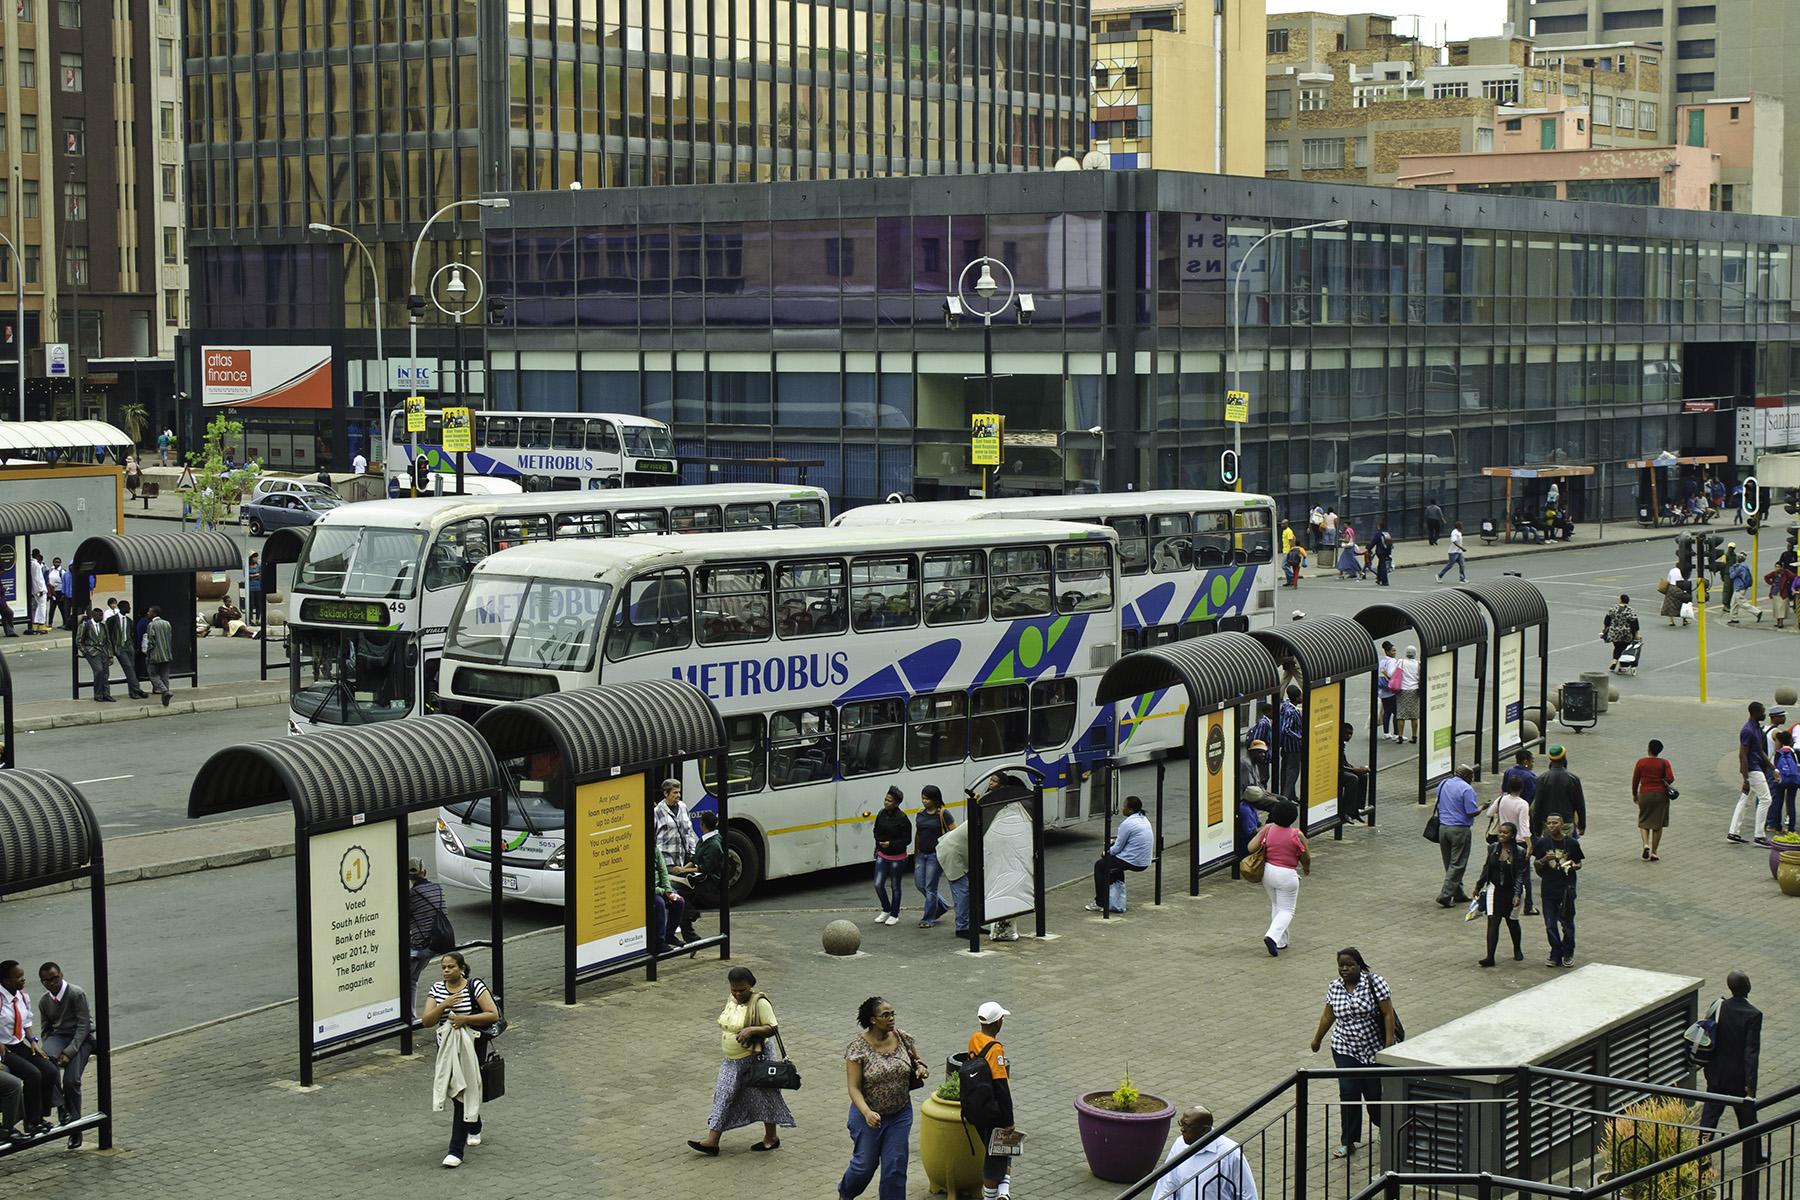 Buses at Gandhi Square in Johannesburg